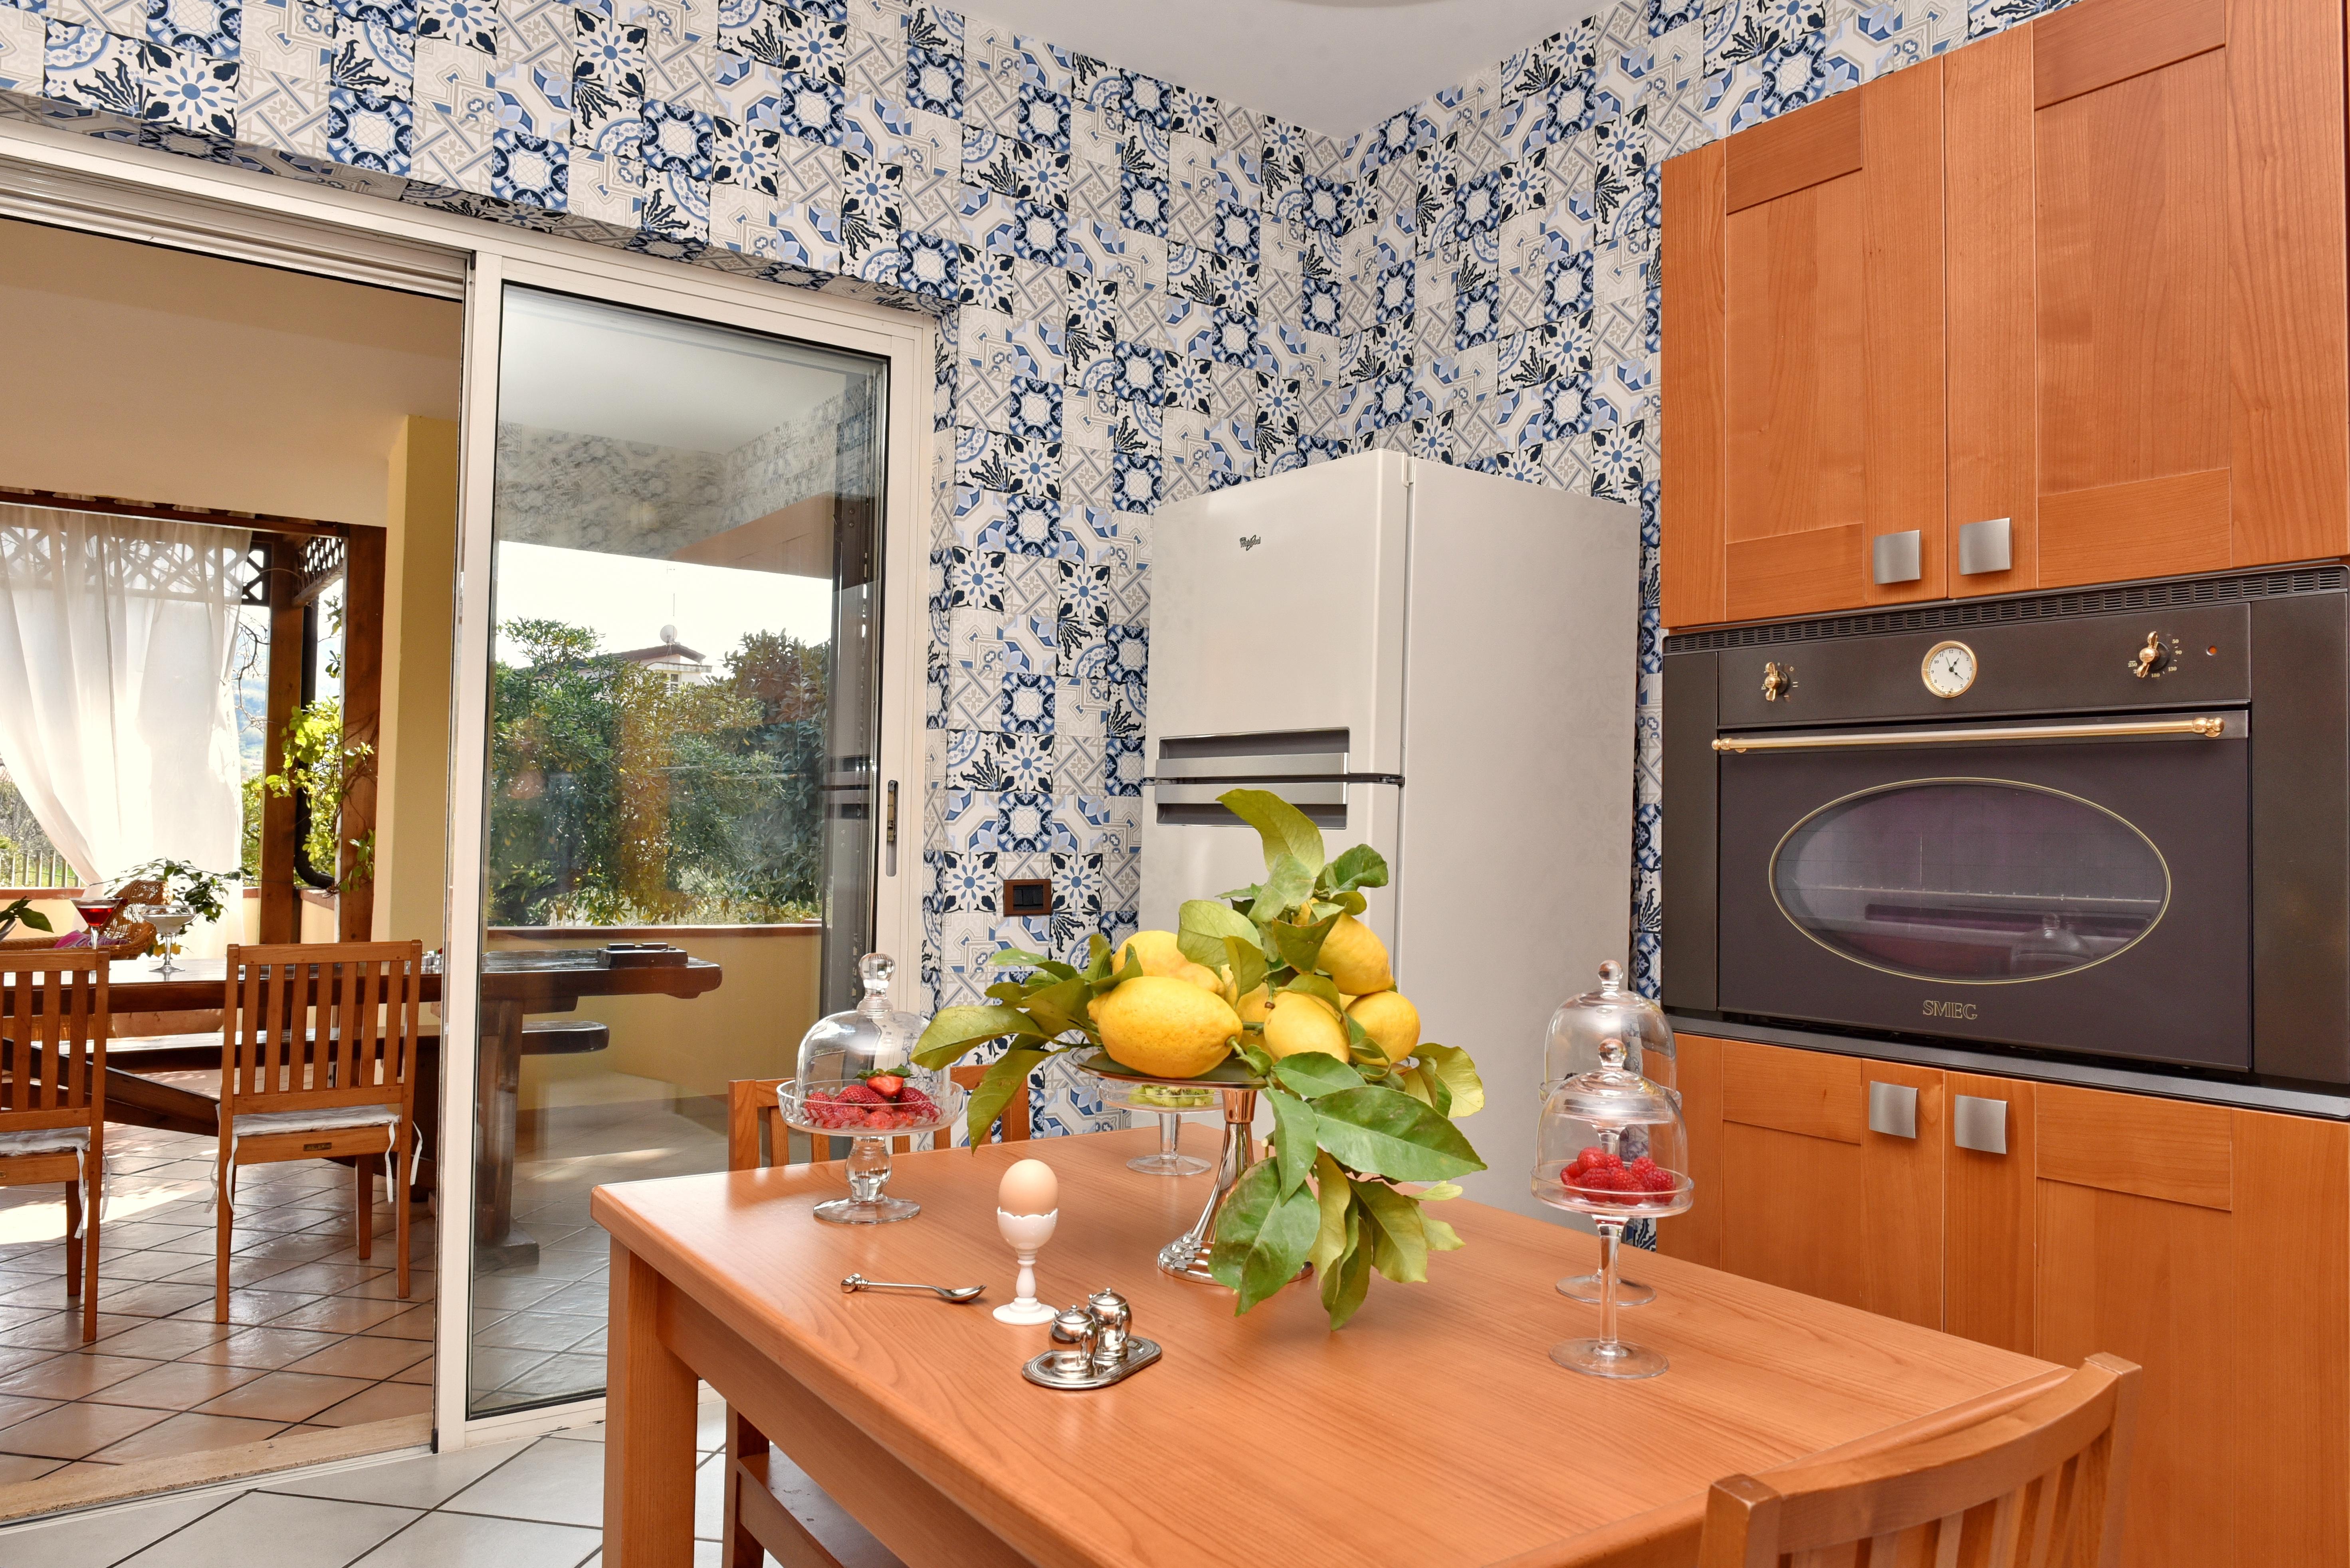 Cucina Villa Belmonte 3